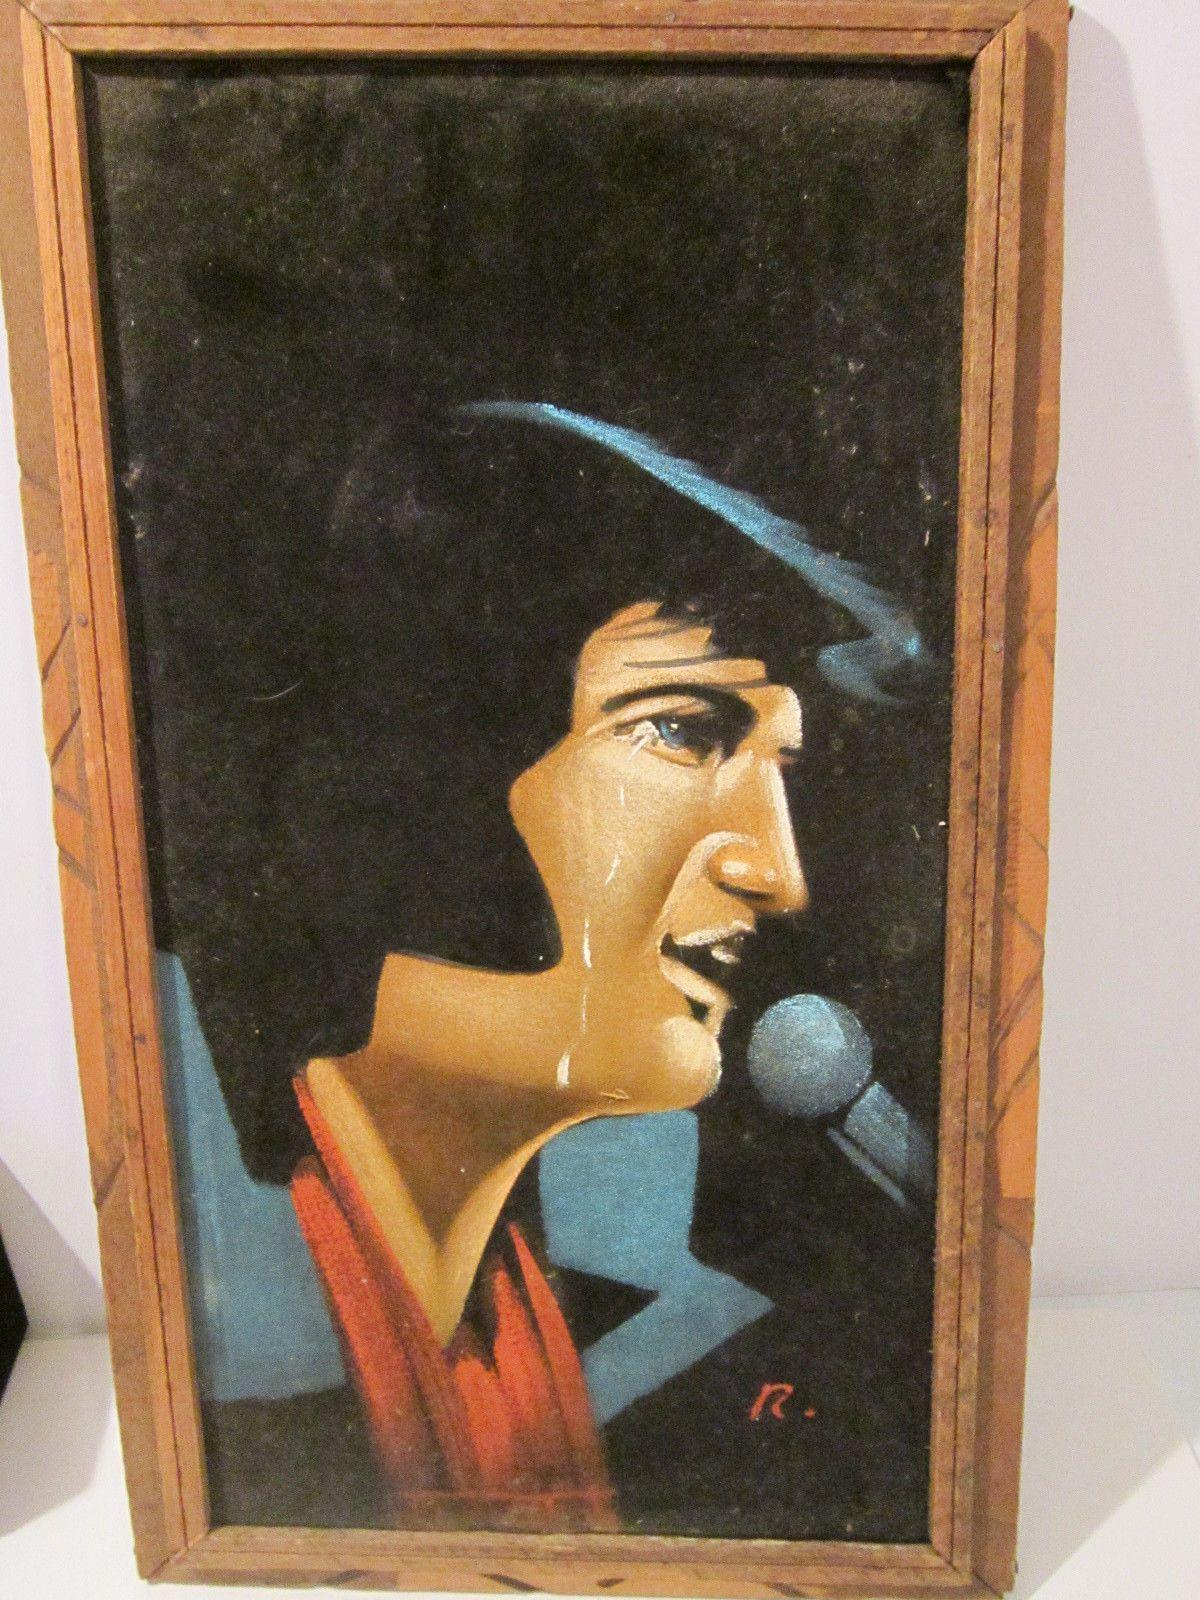 Elvis Presley Vintage Mug Shots Of Famous People/celebrity ...  |1977 Elvis Painting